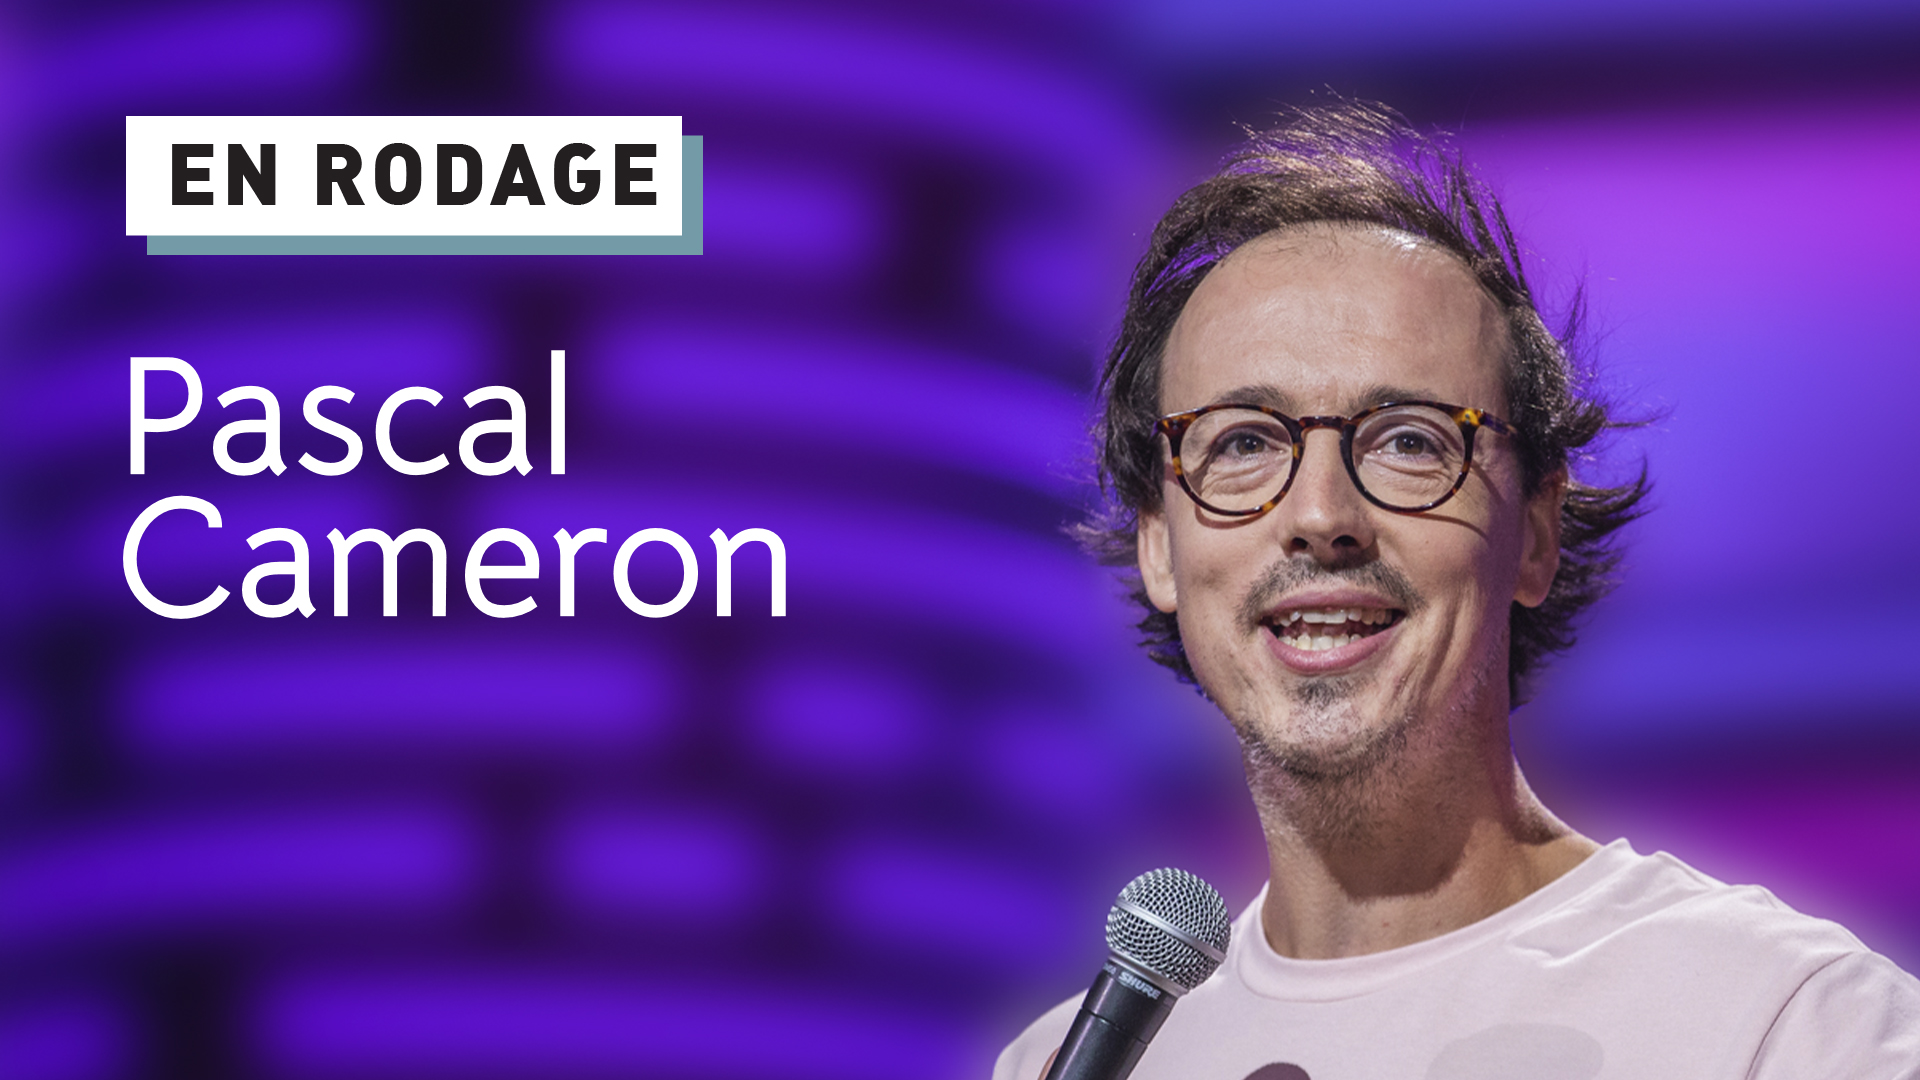 Pascal Cameron - Rodage